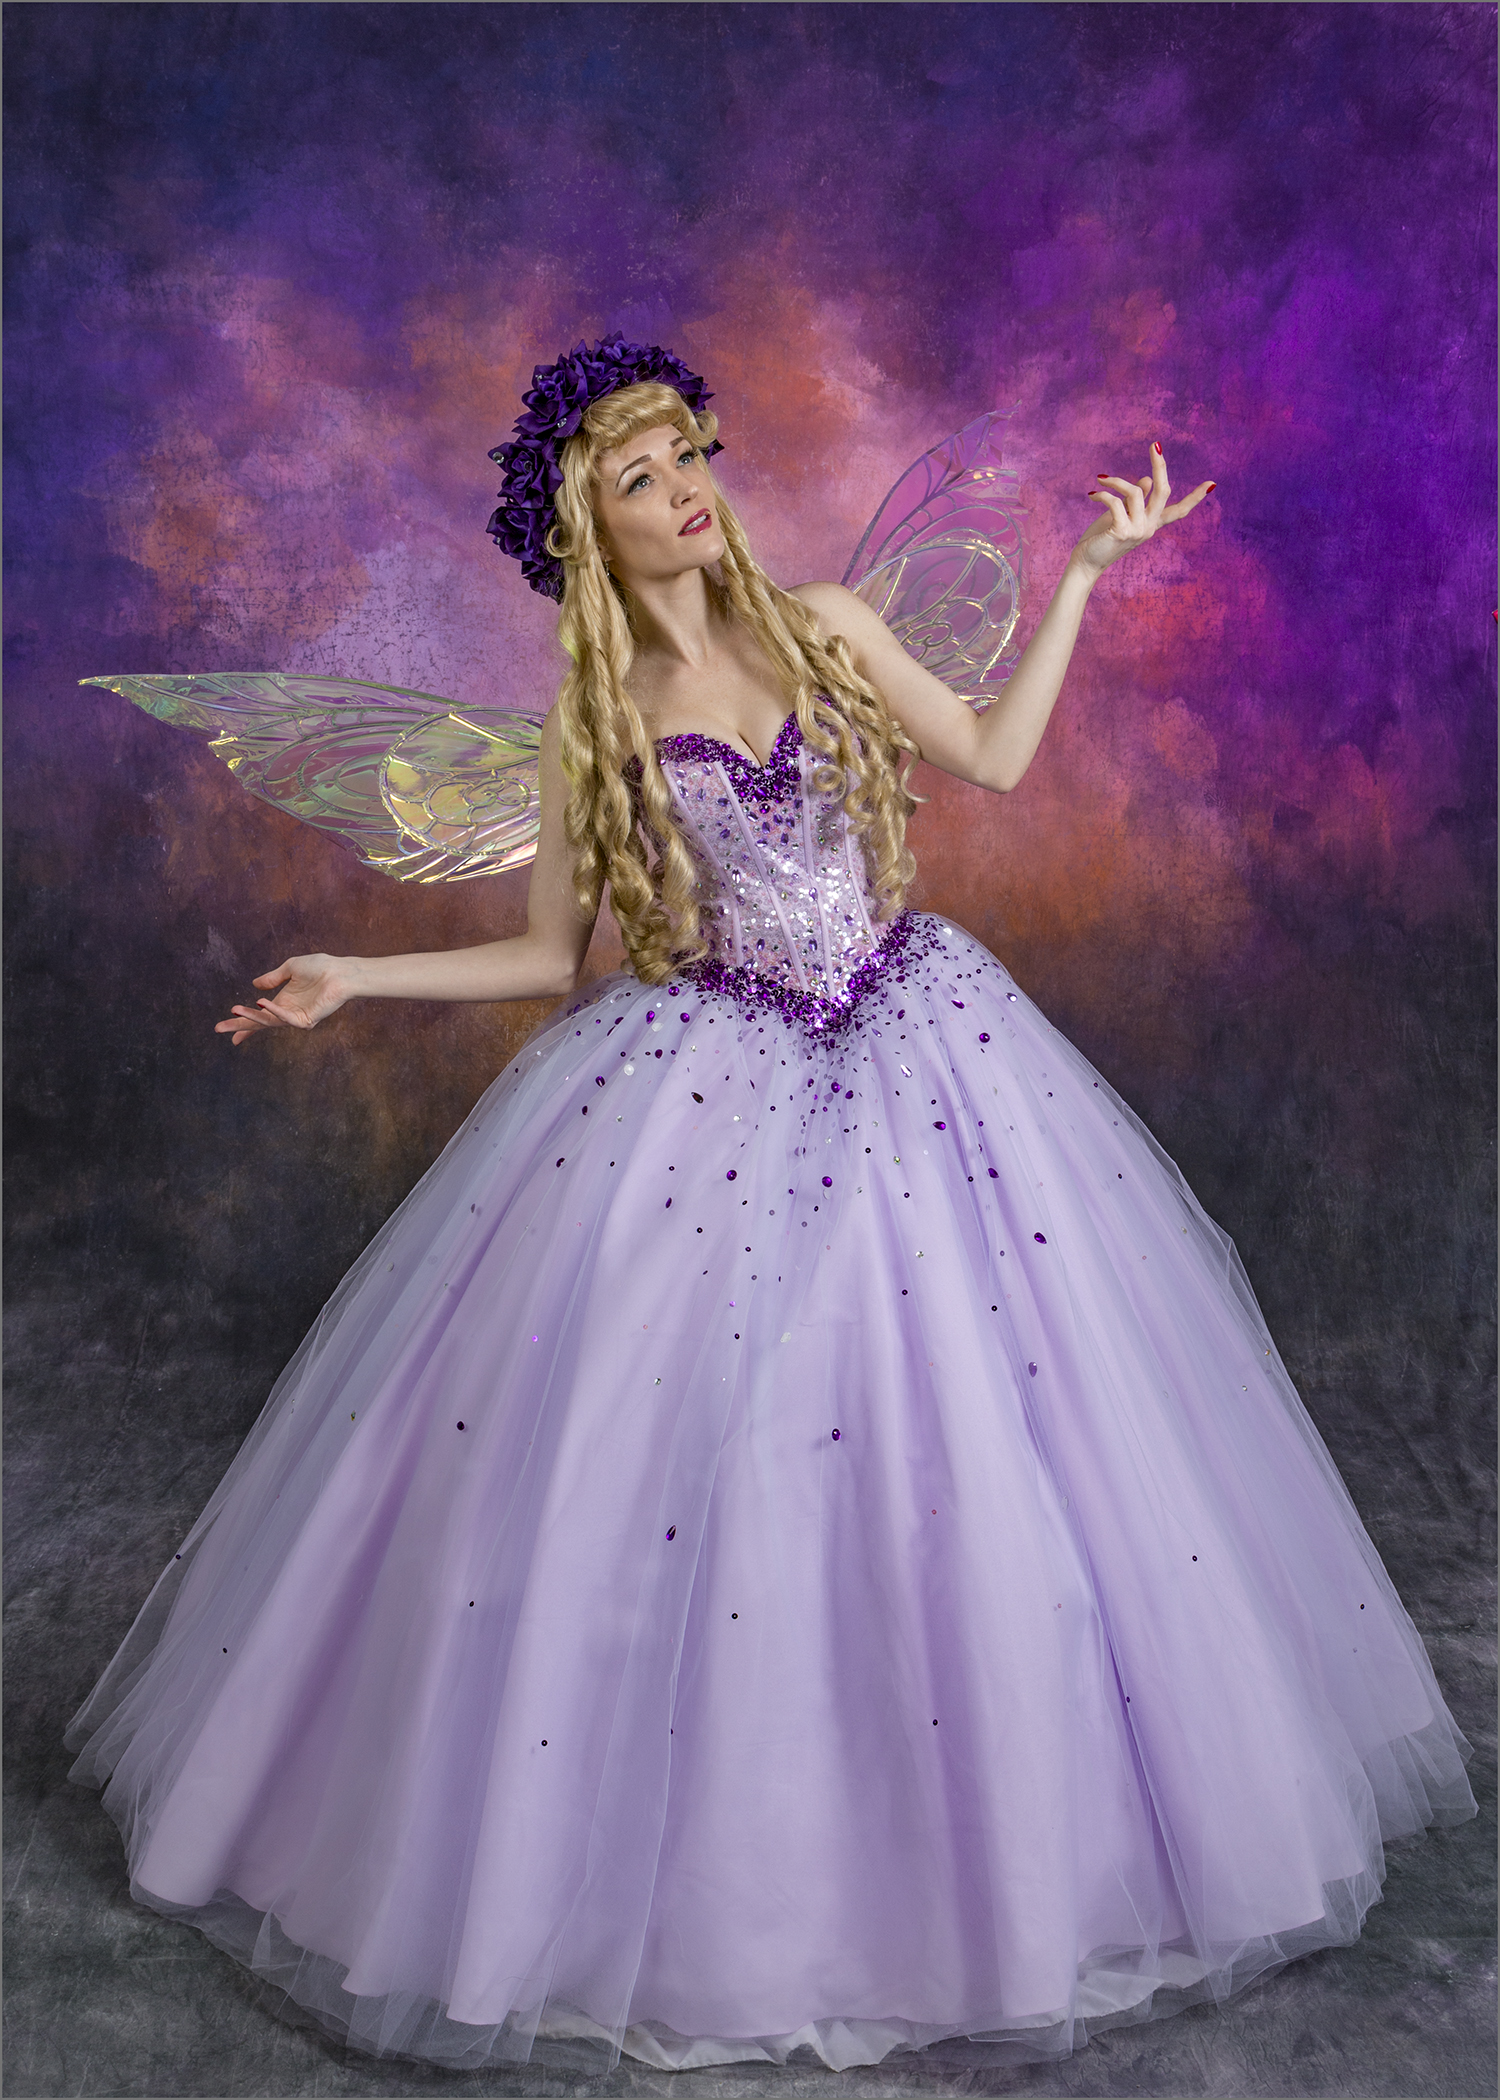 _60A1702 Kalinda fairy-03 5x7.jpg